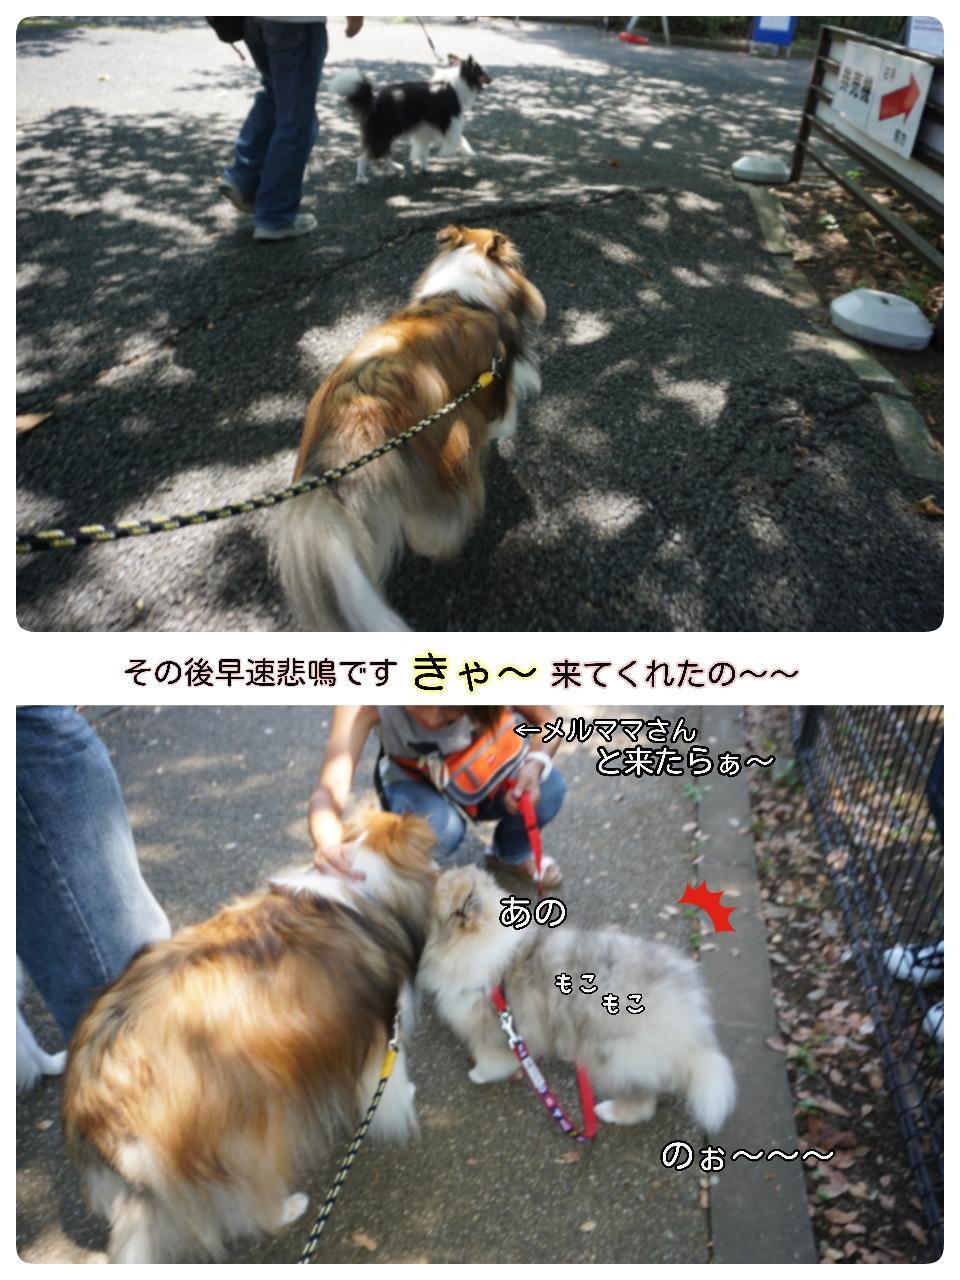 16-09-10-16-58-03-608_deco.jpg